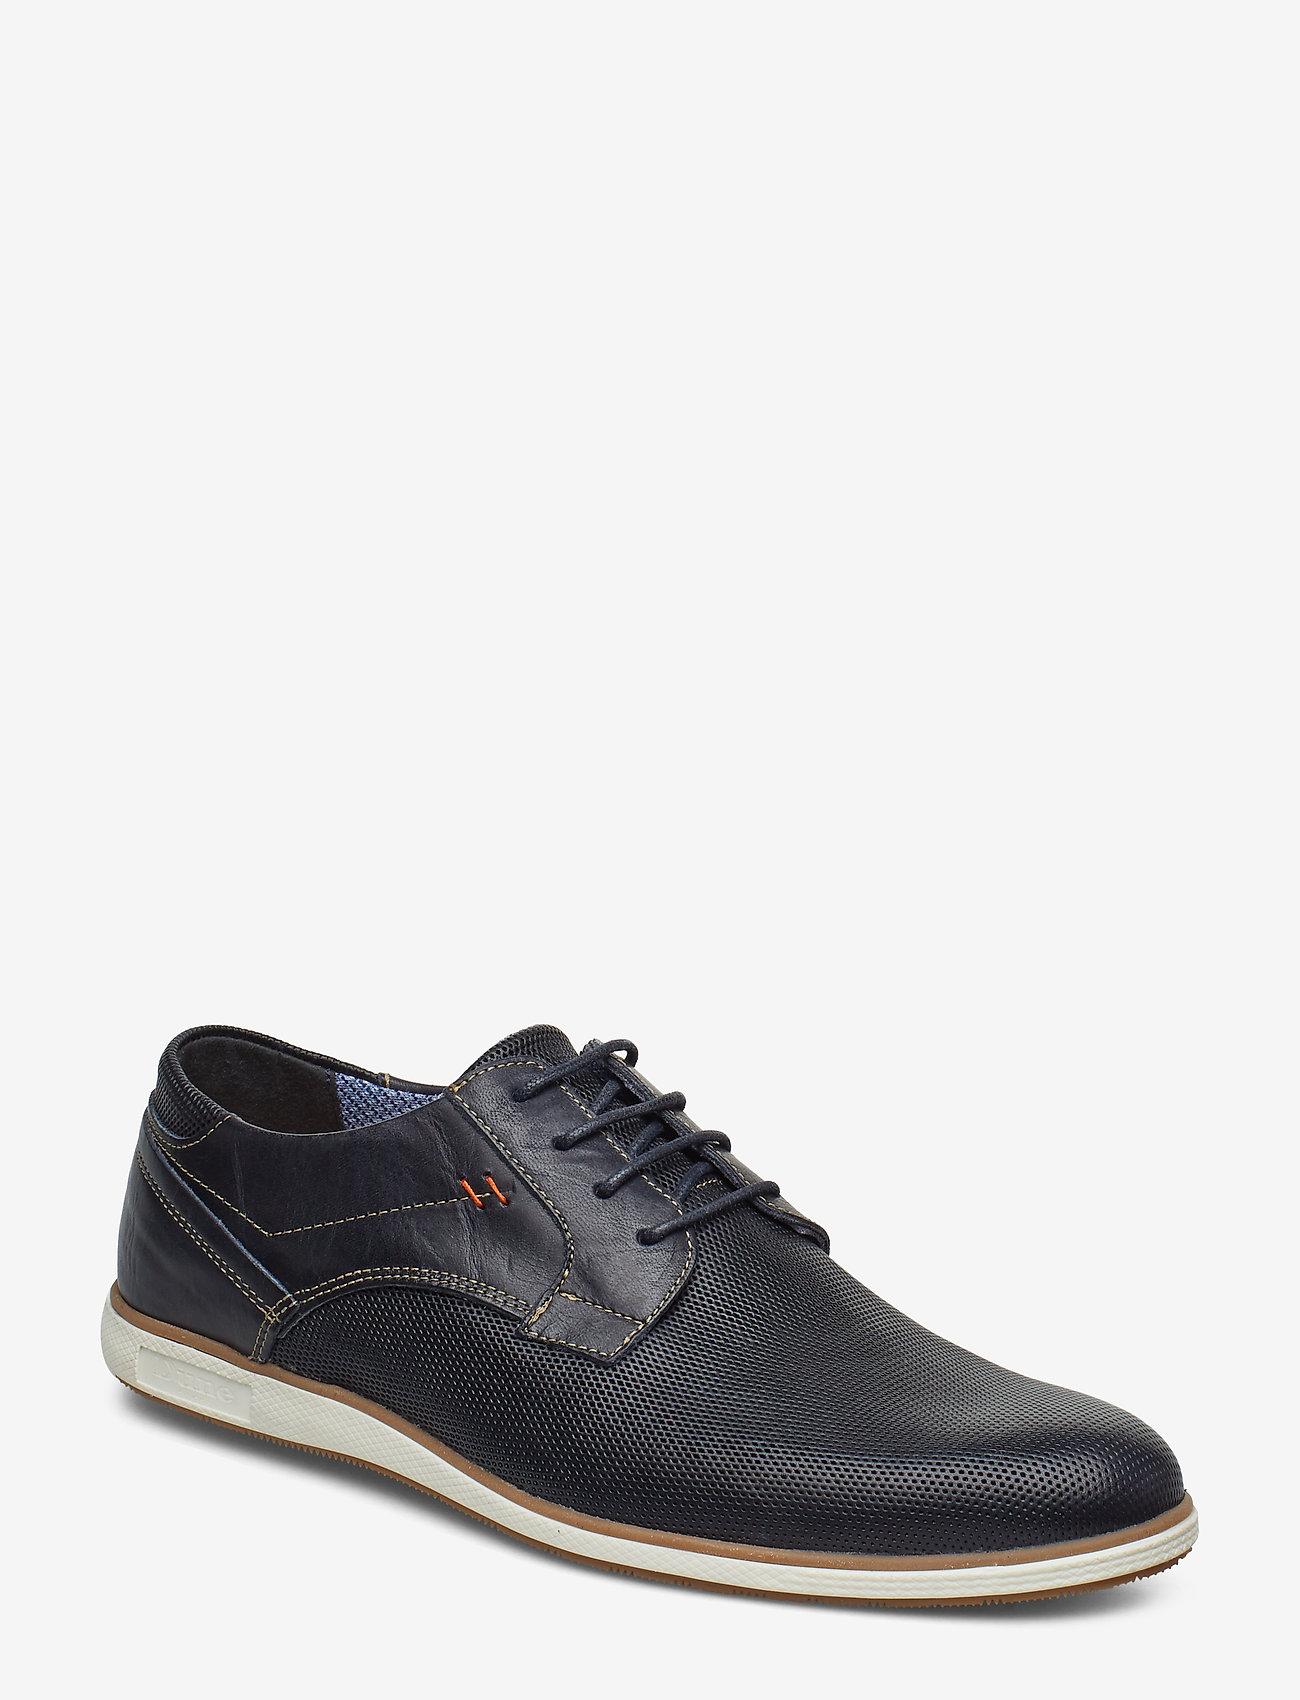 Dune London - BAMFIELD - low tops - navy-leather